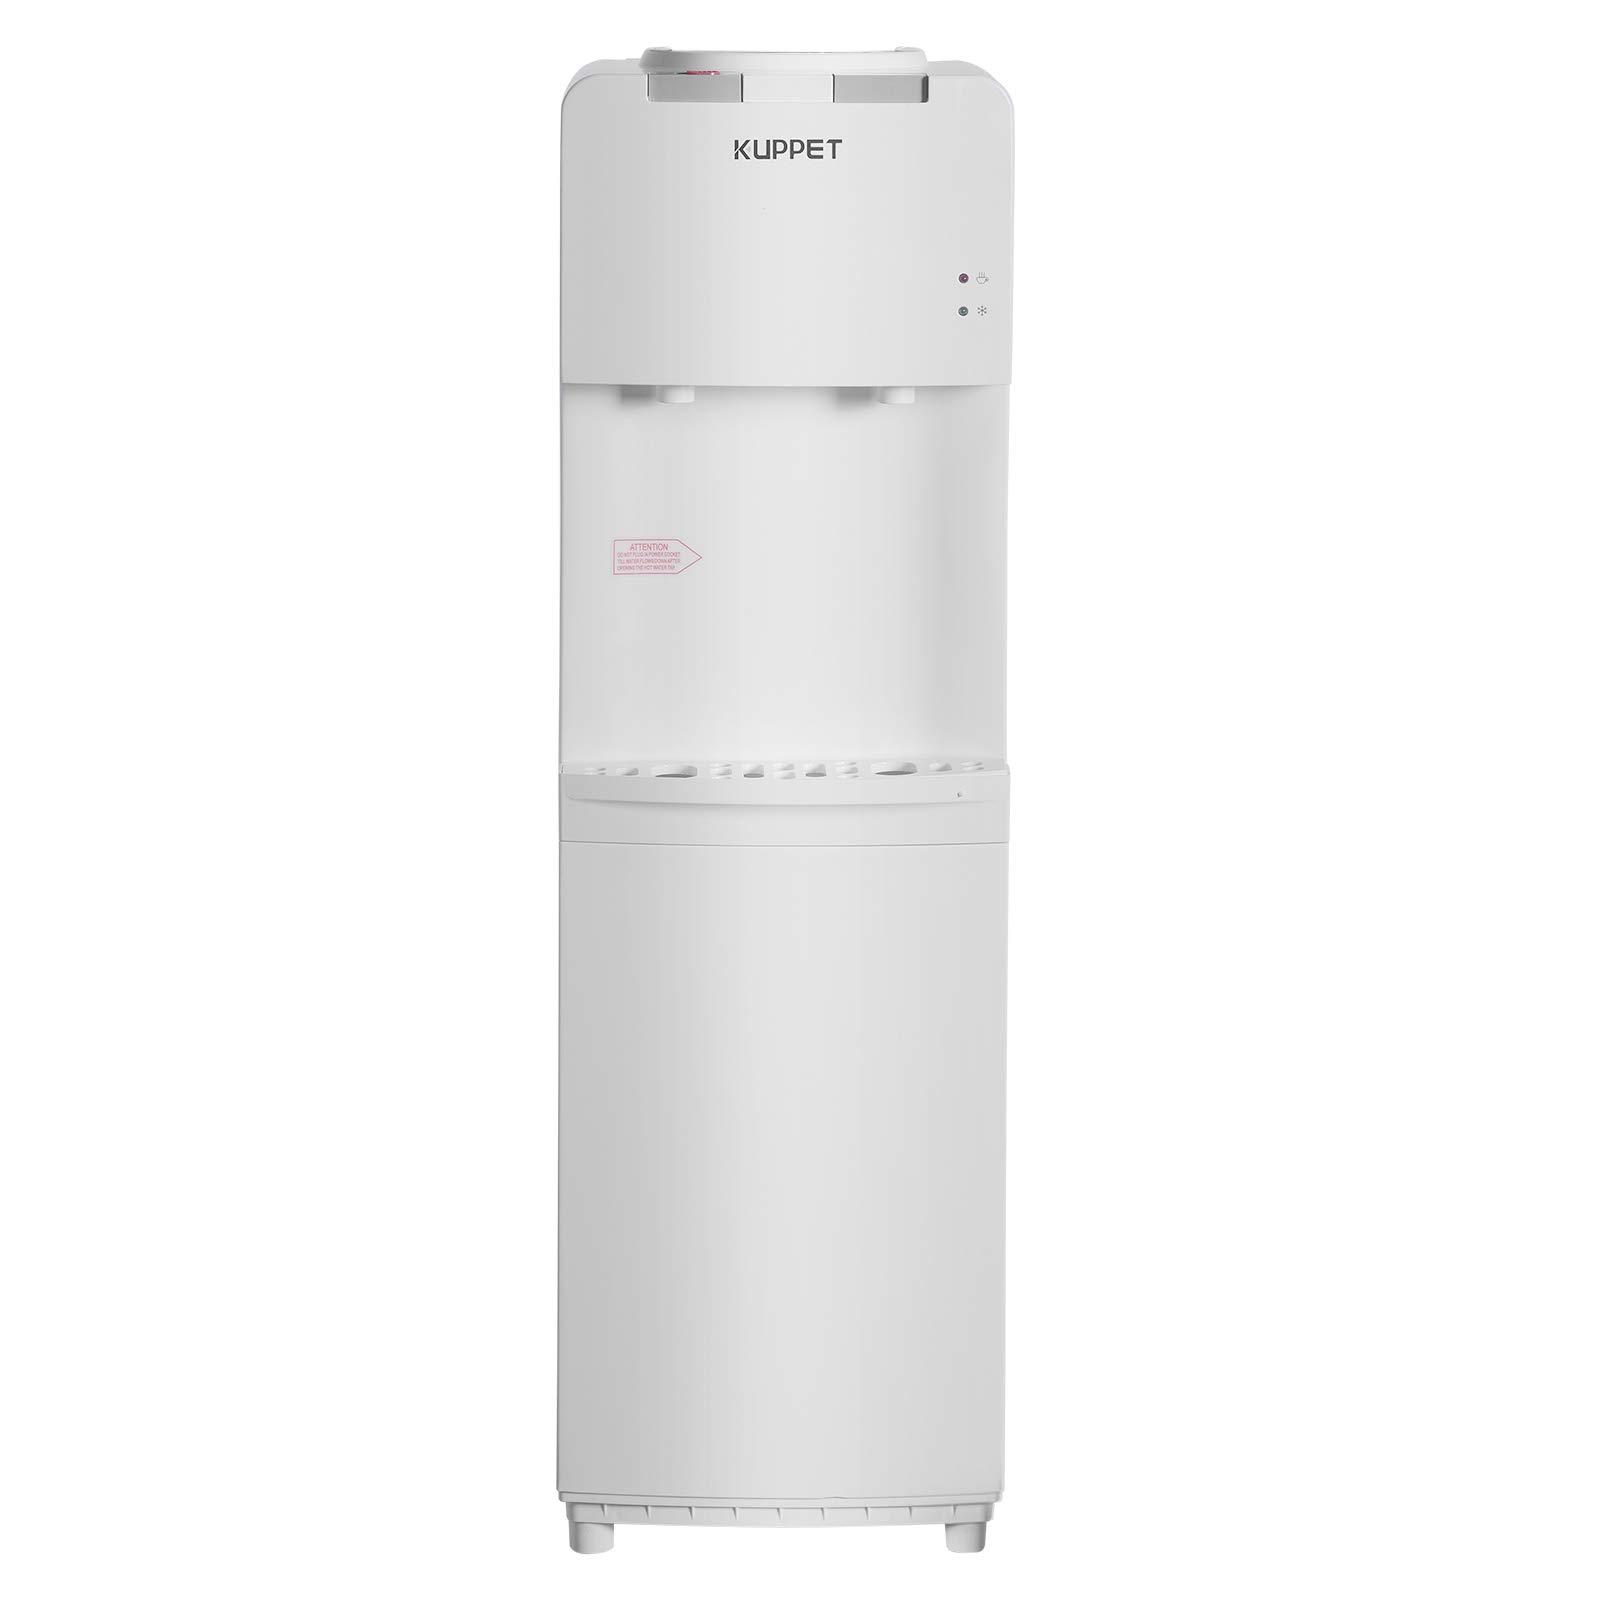 KUPPET Water Cooler Dispenser, Top Loading Freestanding Water Dispenser, Compressor Cooling, Two Temperature Setting Hot(190.4℉-203℉) & Cold(42.8℉-50℉),Stainless Steel, White